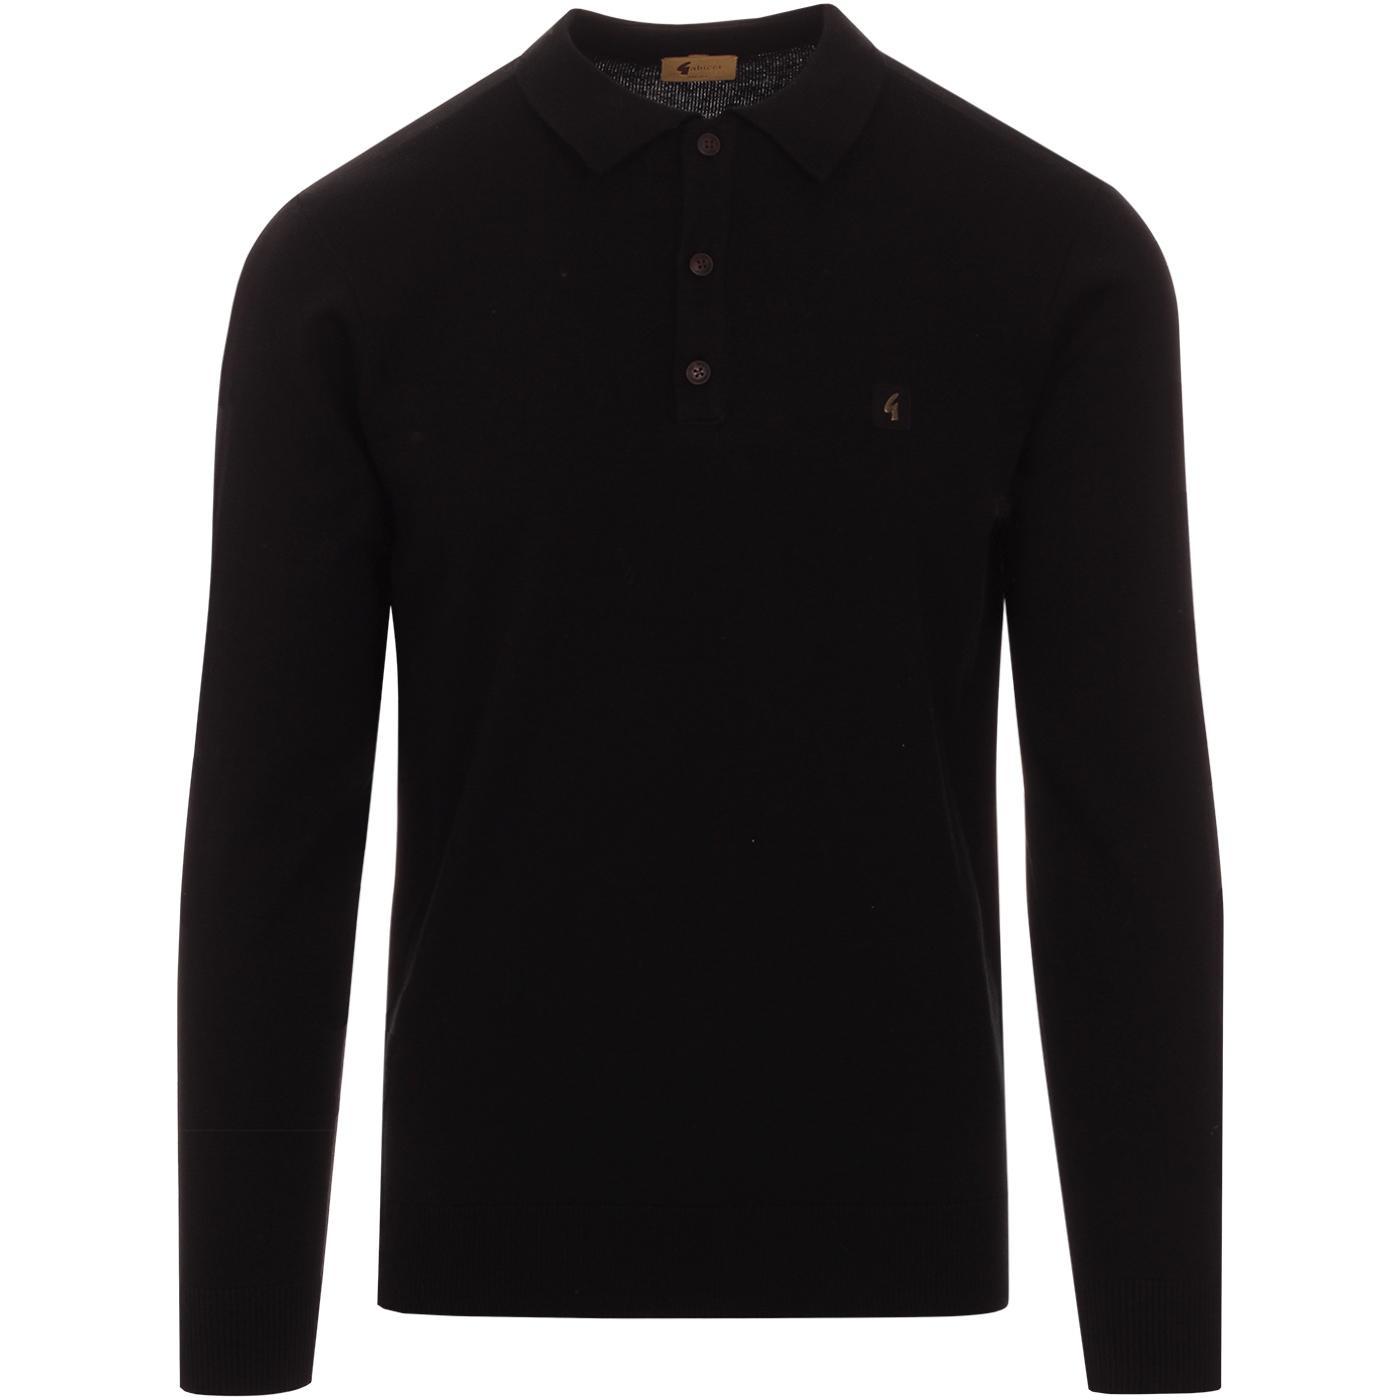 Francesco GABICCI VINTAGE Mod Knit Polo Top BLACK